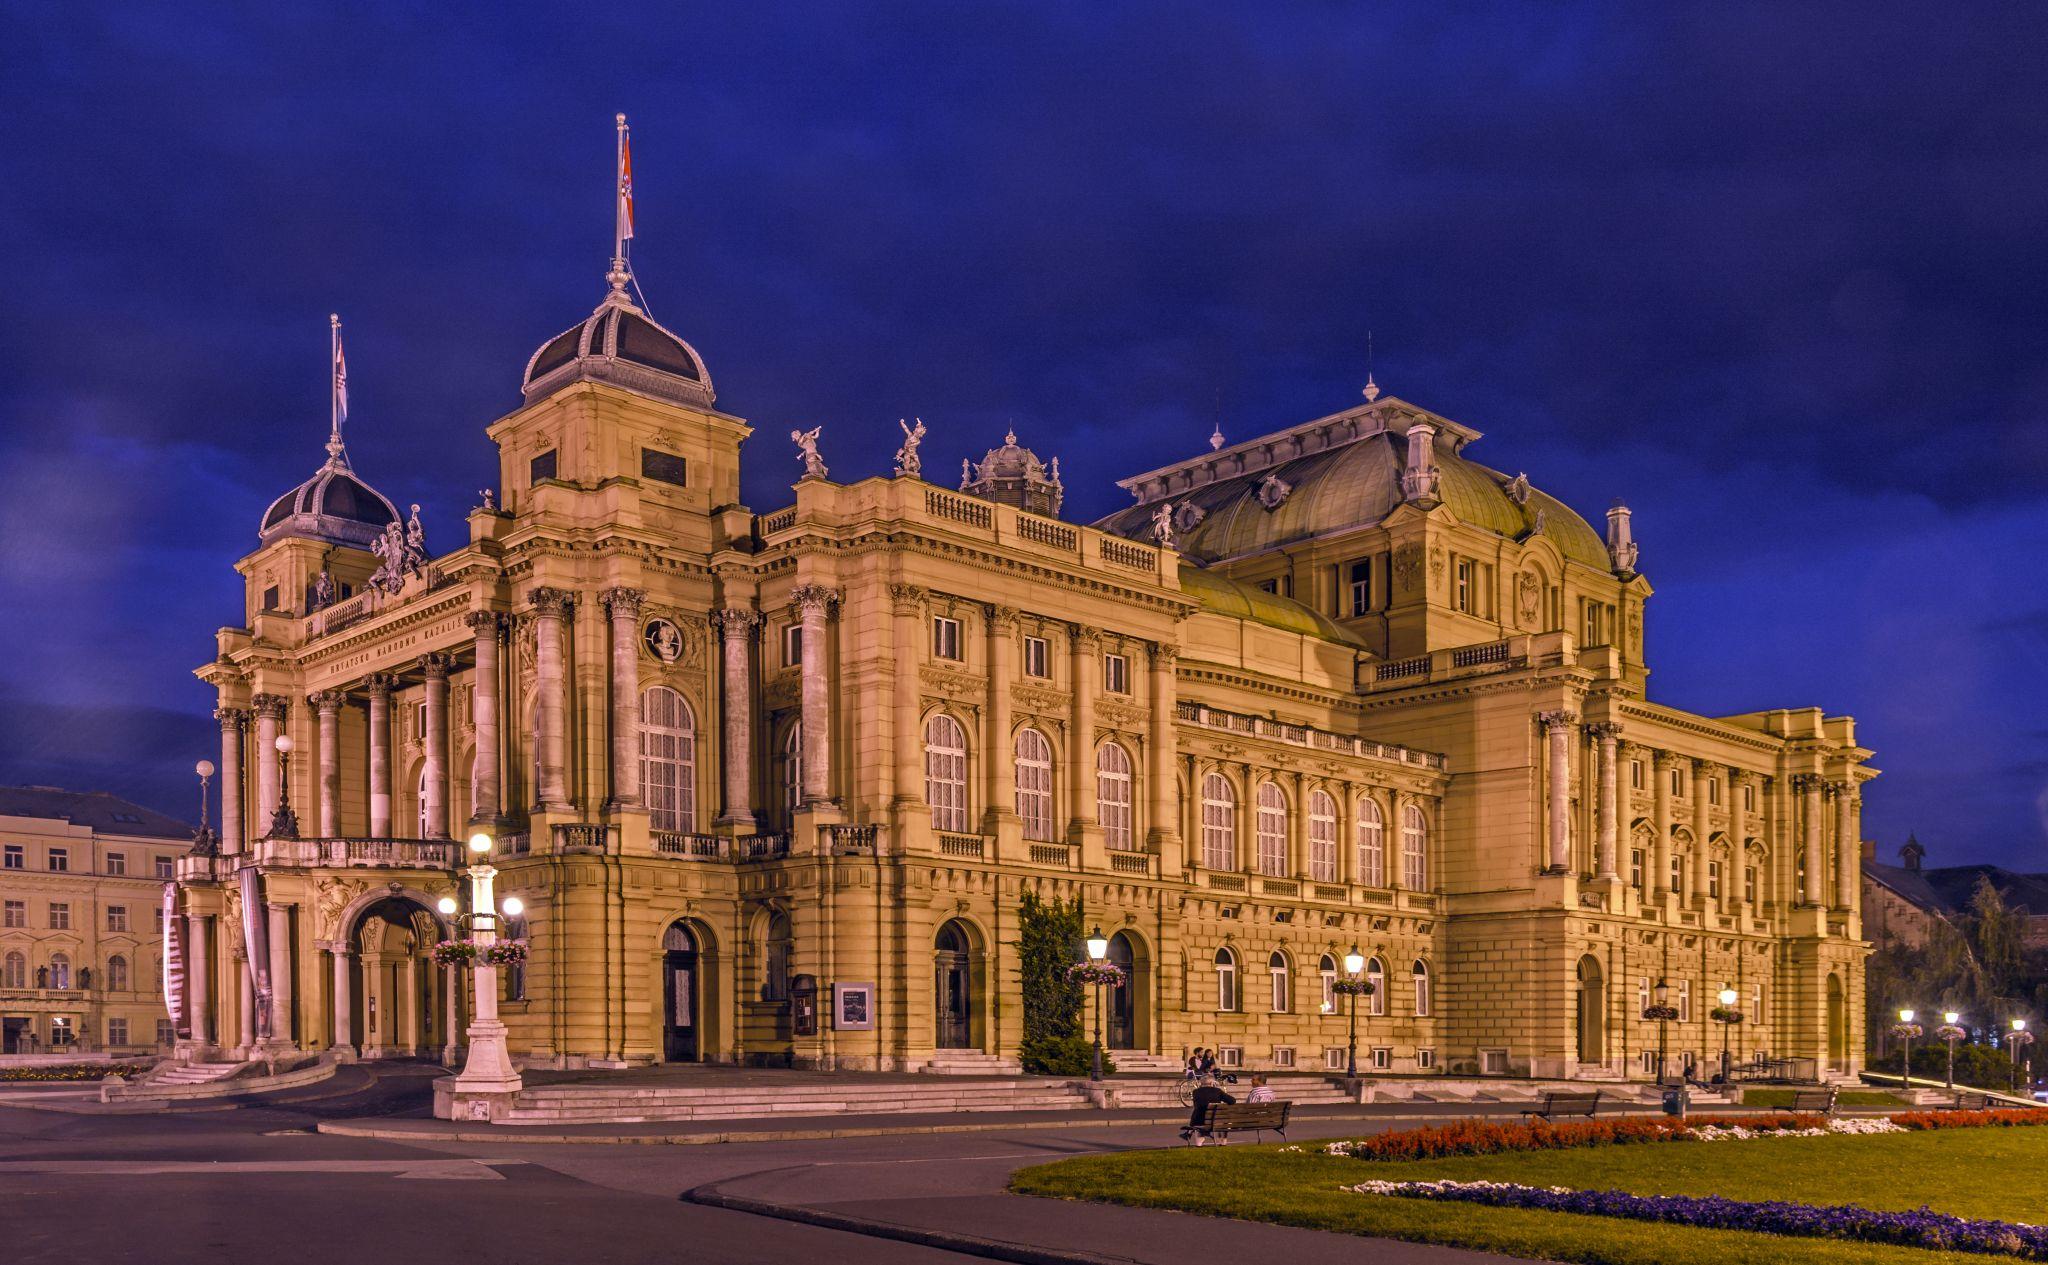 Croatian National Theatre, Croatia